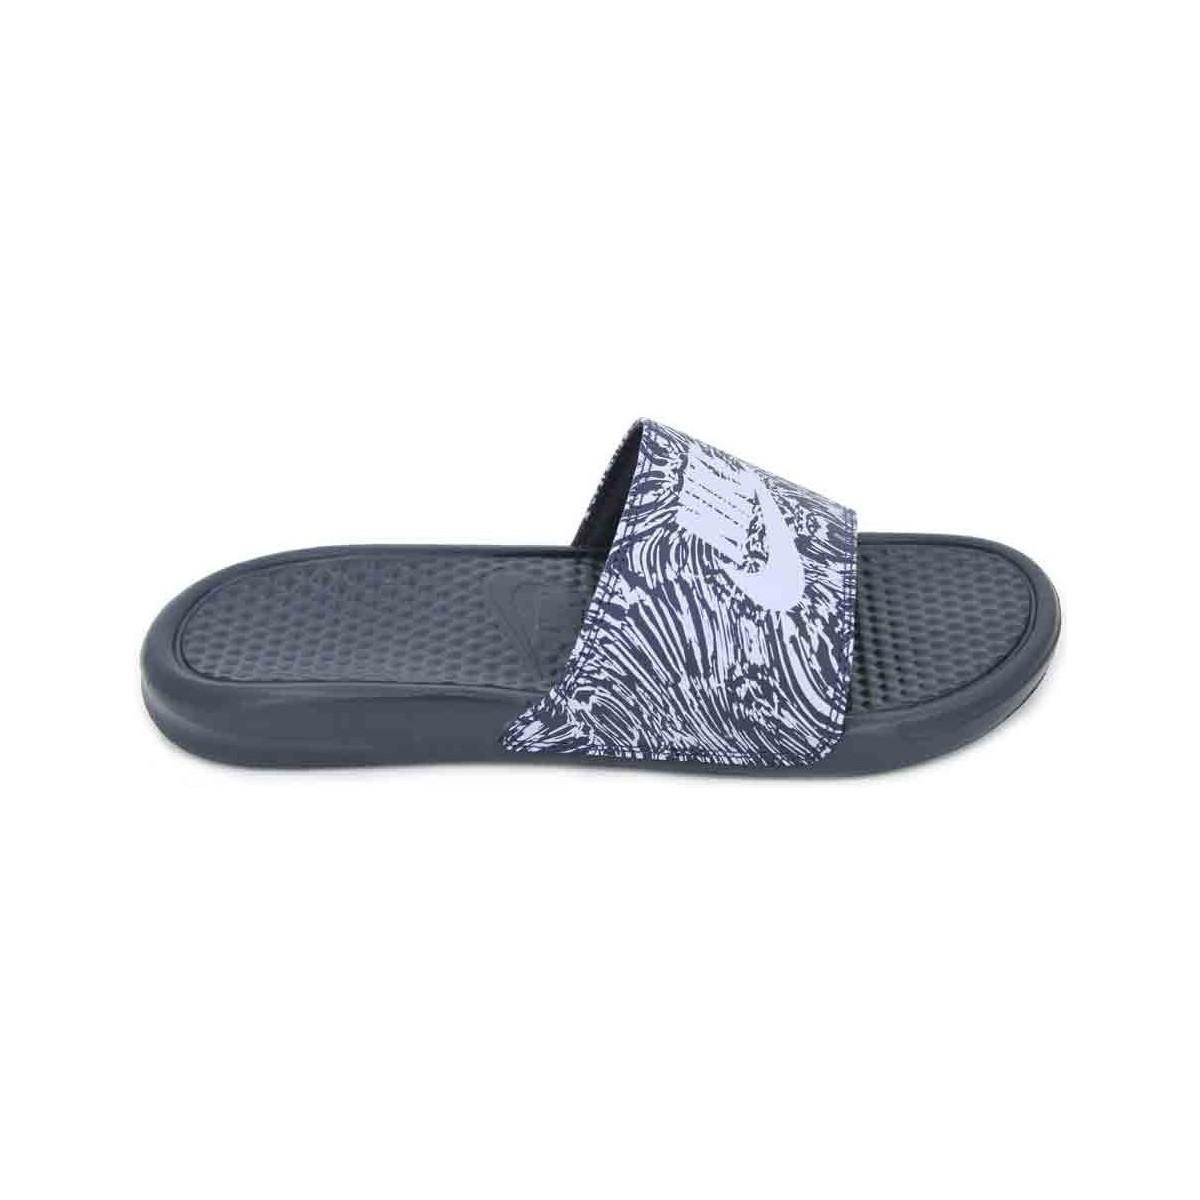 b009611ade0f48 Nike Benassi Jdi Print 631261 Men s Flip Flops Men s Sandals In ...